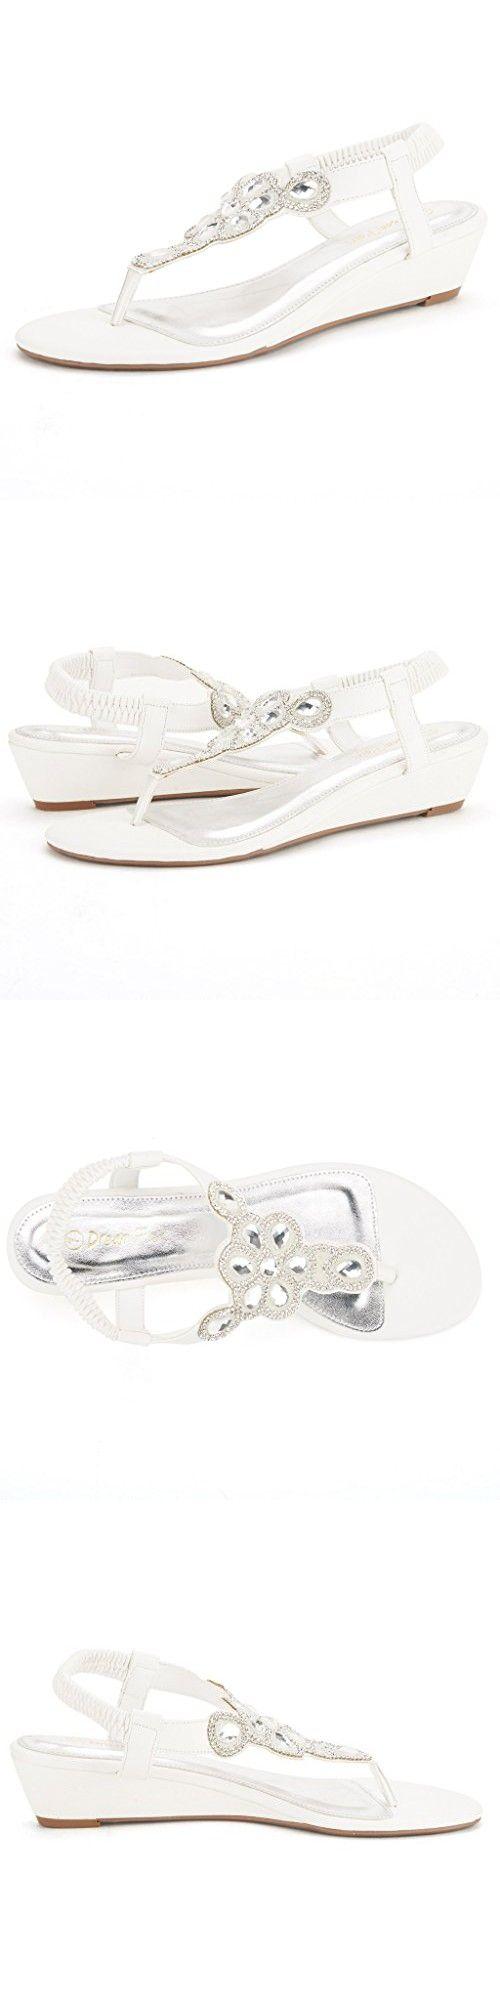 Black sandals size 11 - Dream Pairs Pershian Women S Summer Low Heel Casual Fashion Design Elastic Back Rhinestone T Flat